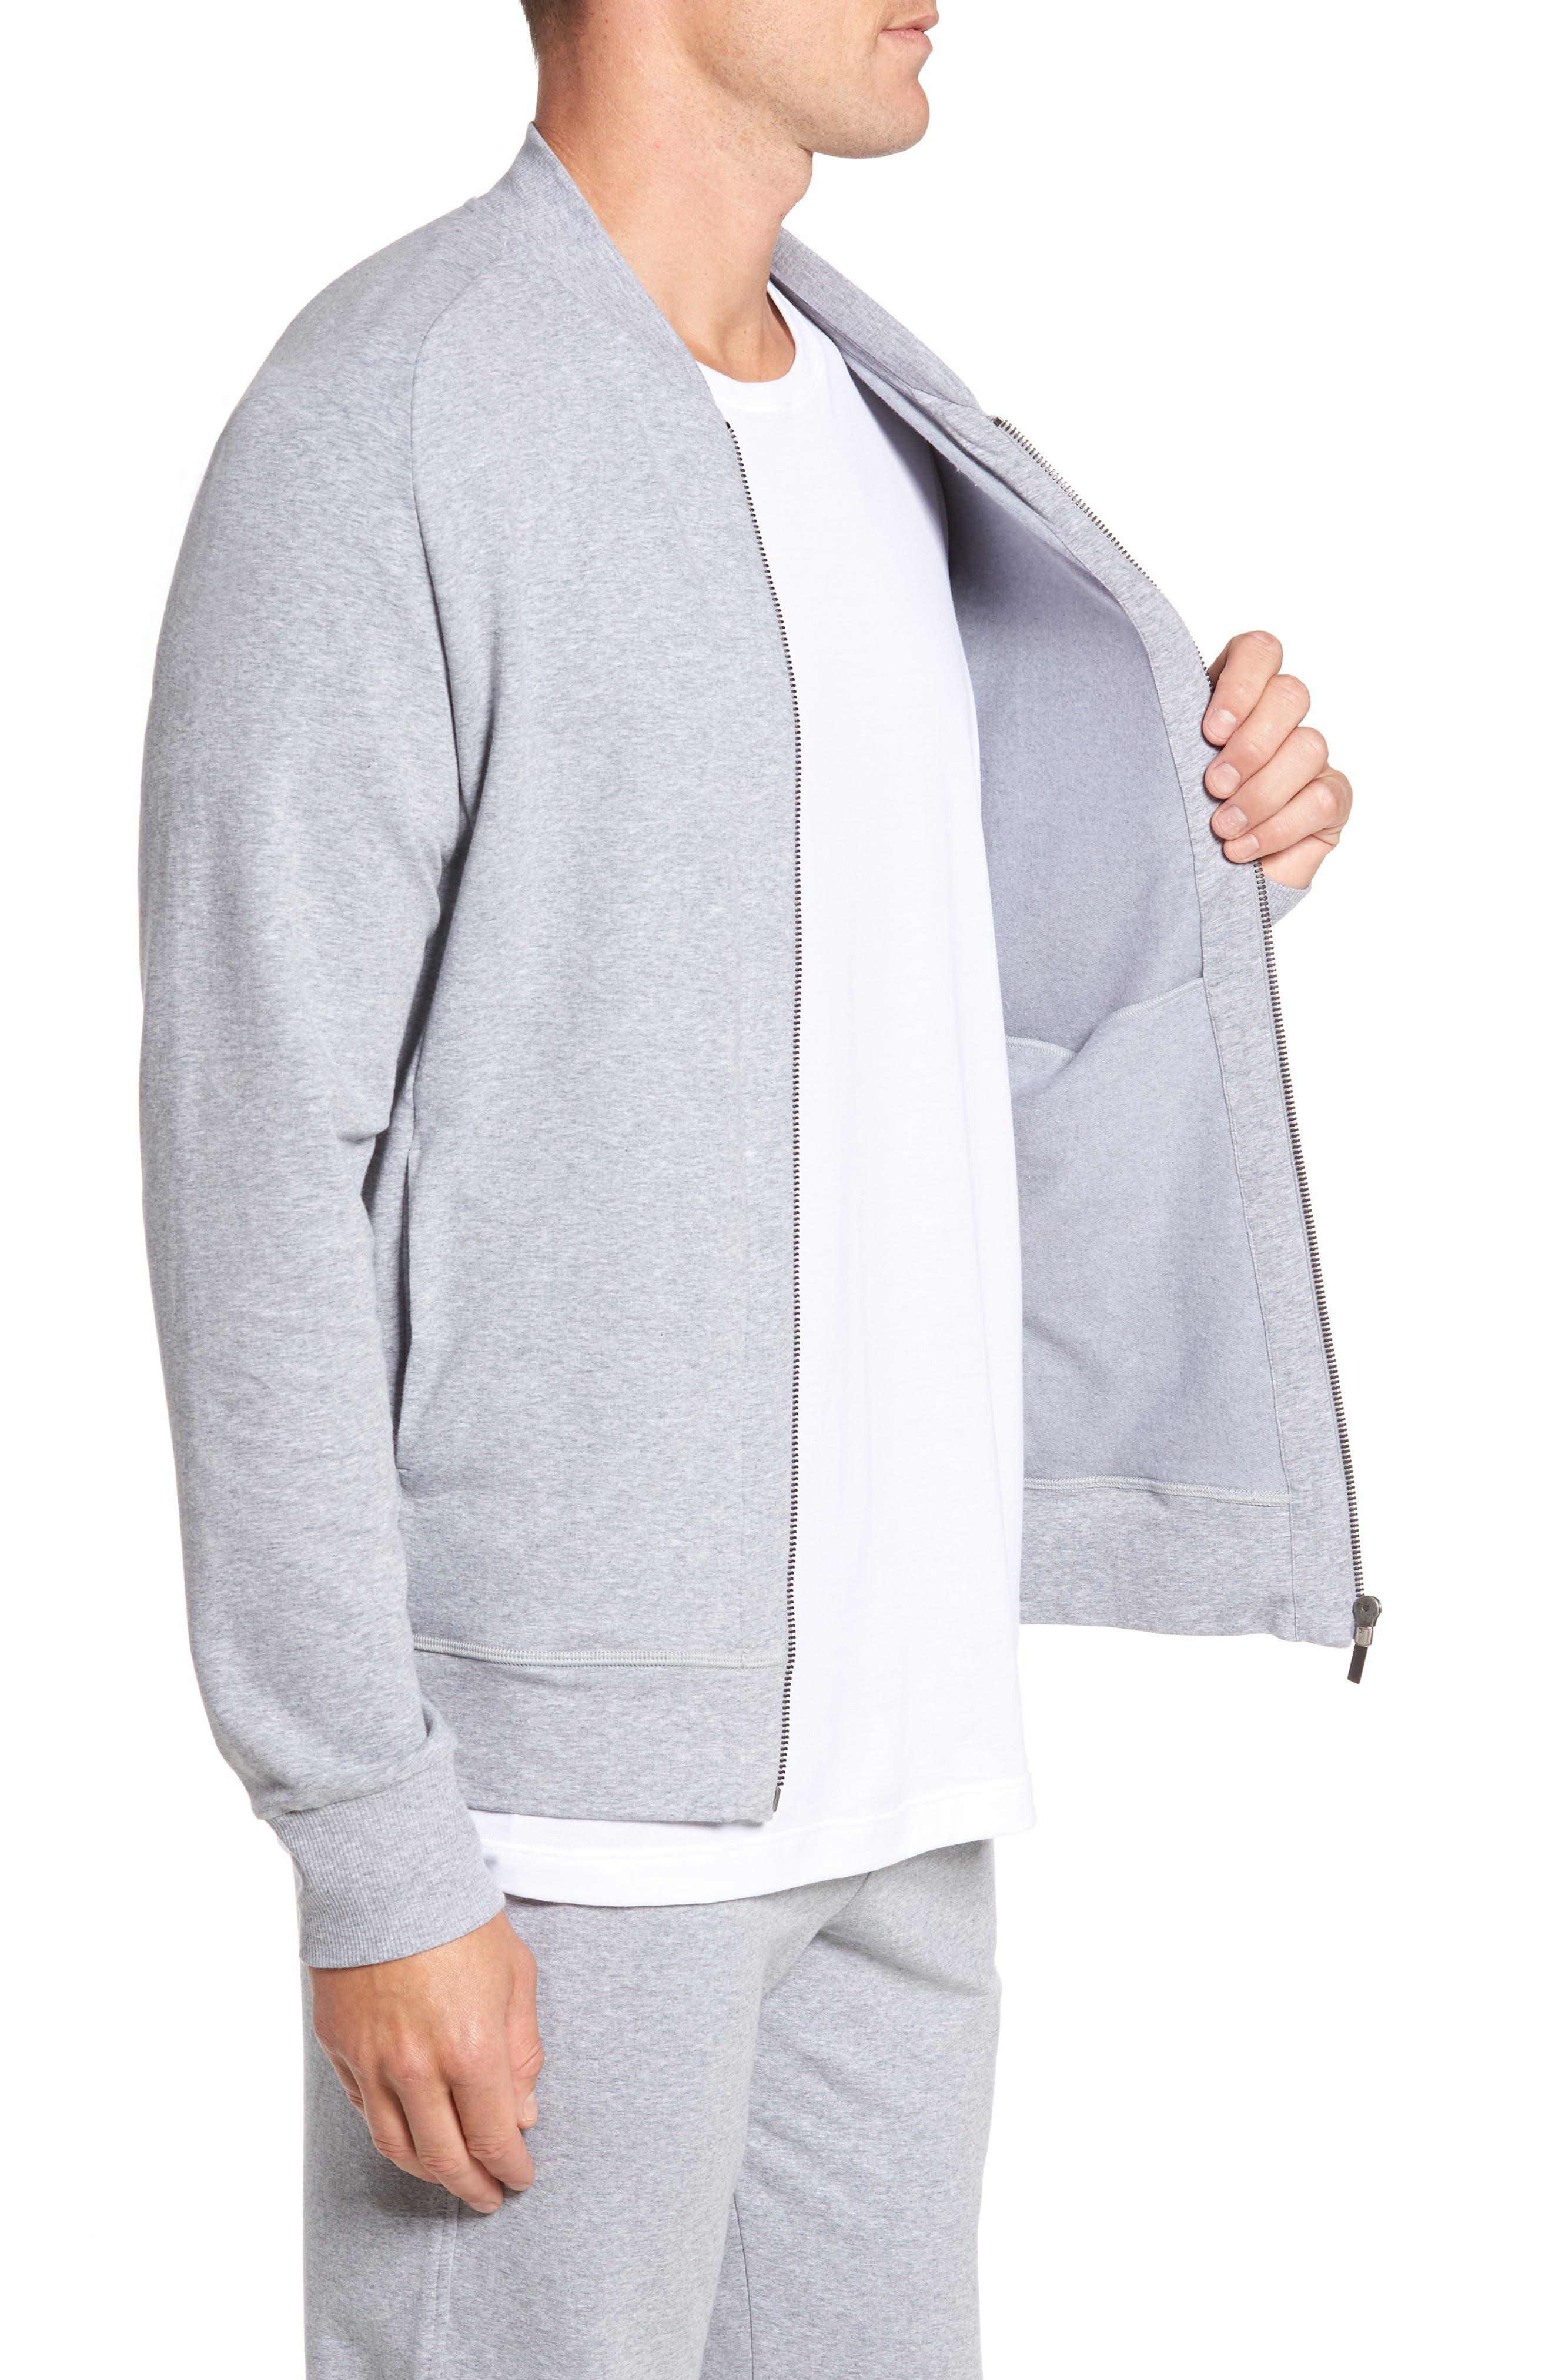 Living Zip Bomber Jacket,                             Alternate thumbnail 3, color,                             Grey Melange